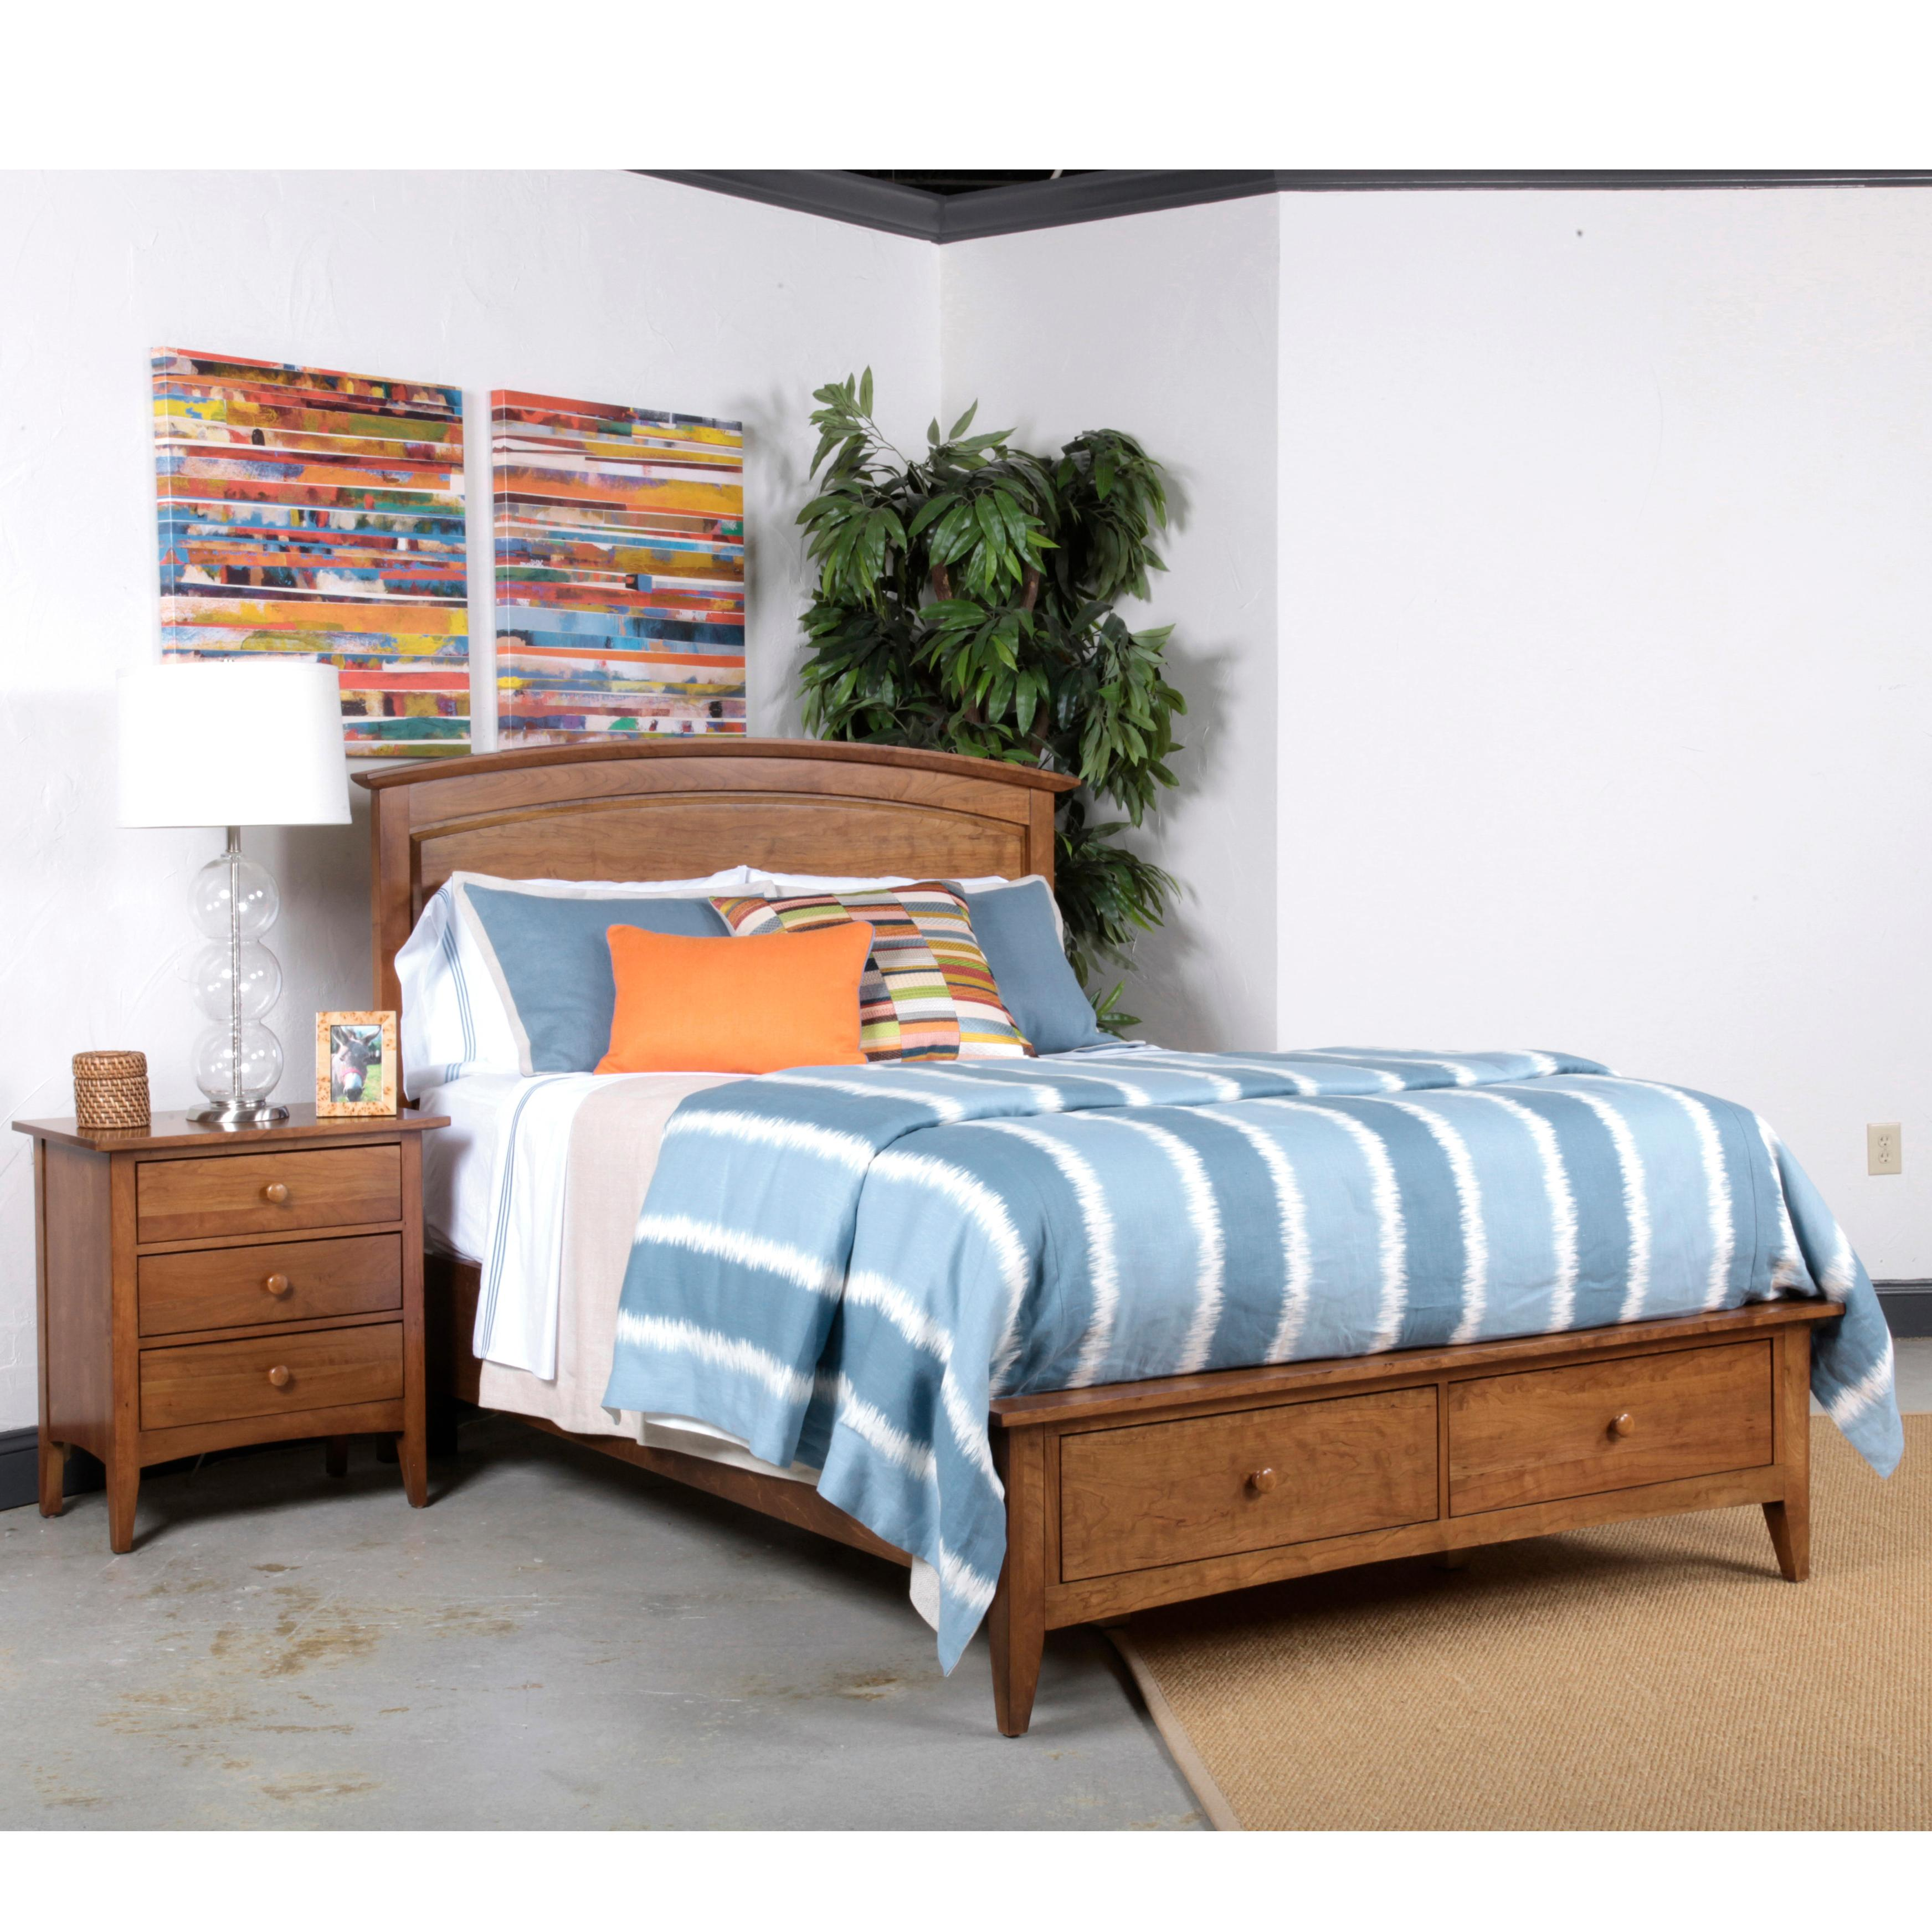 kincaid furniture gatherings king bedroom group adcock furniture bedroom group. Black Bedroom Furniture Sets. Home Design Ideas